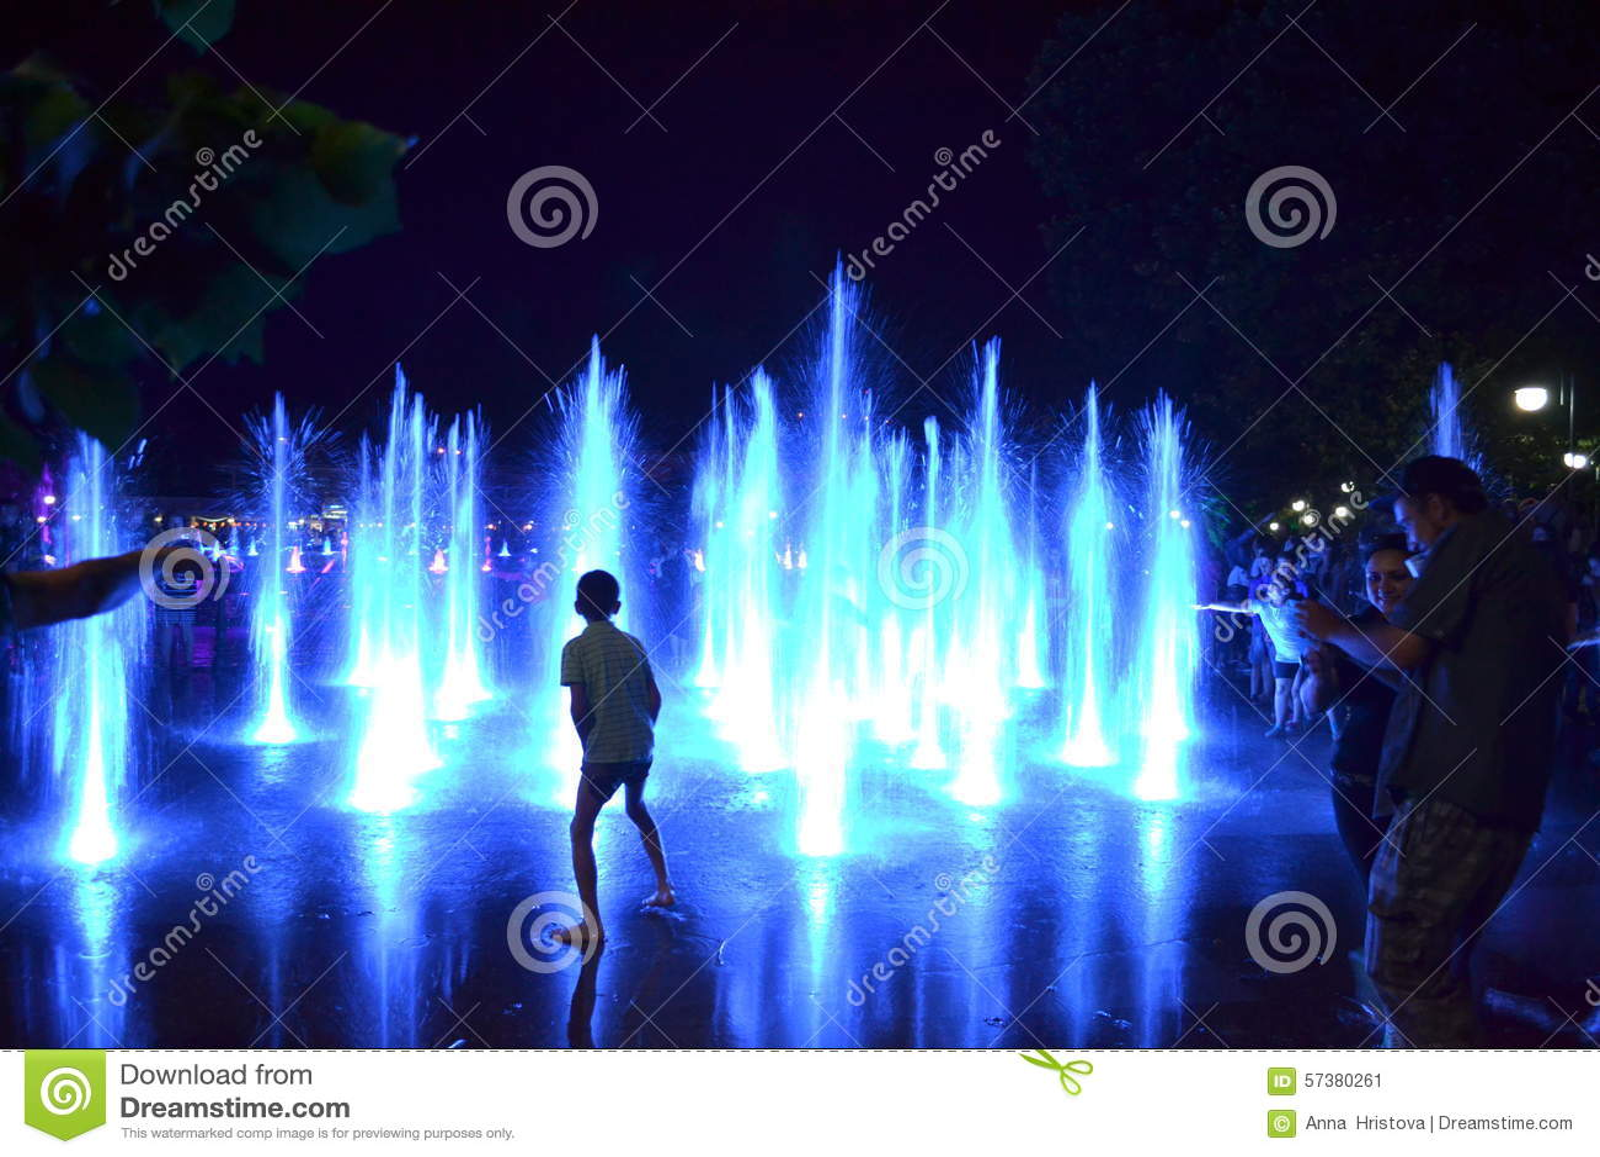 De blauwe fontein spuit mensen